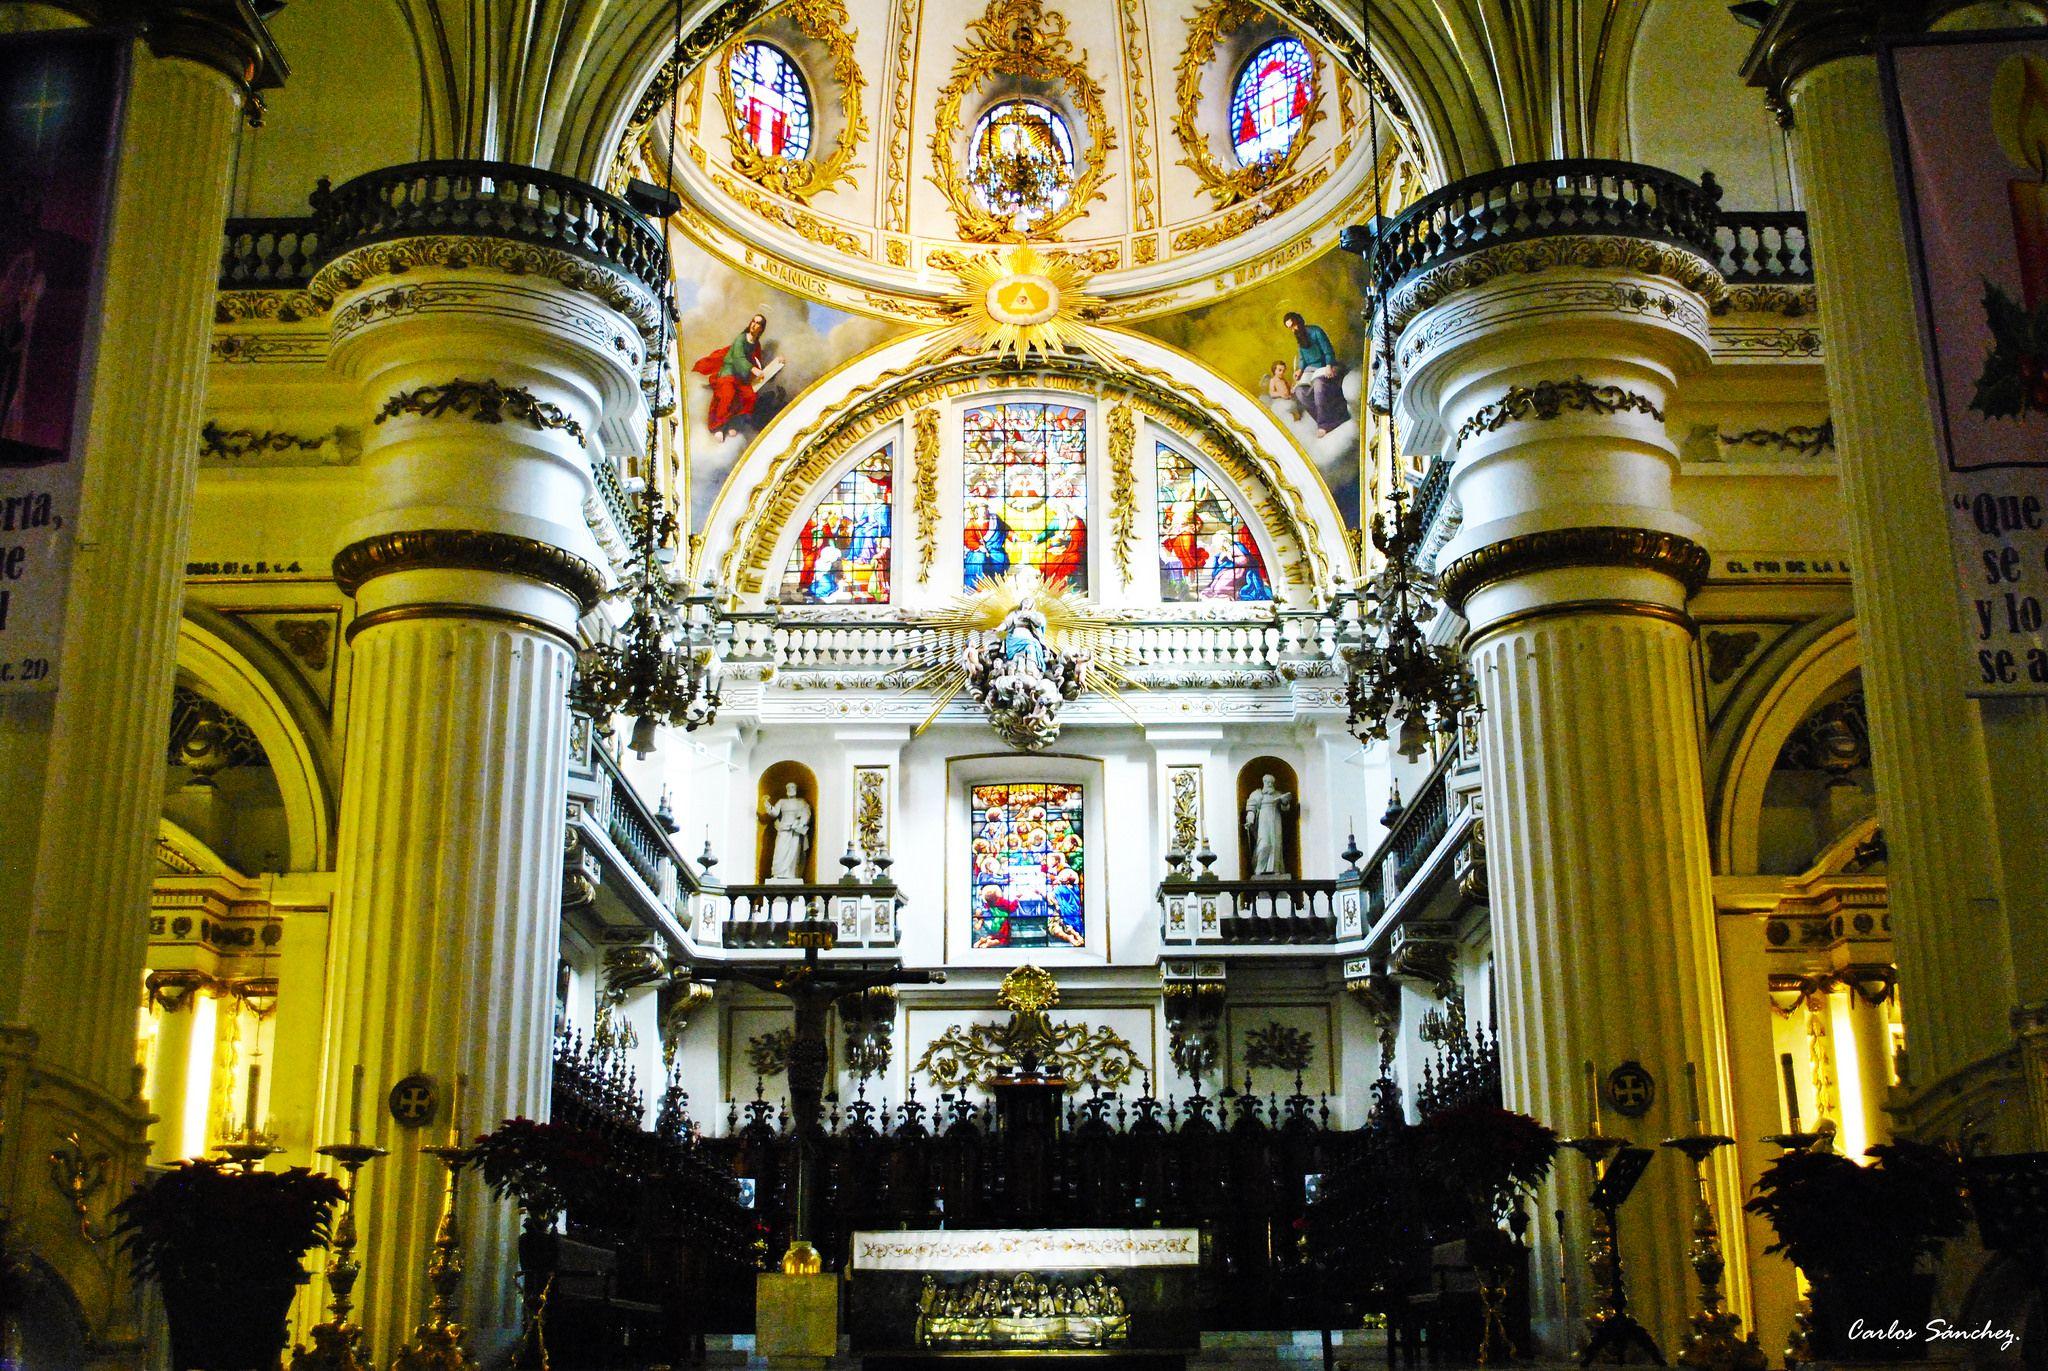 https://flic.kr/p/CCAfxm | Interior de la catedral de Guadalajara. | Guadalajara, México.